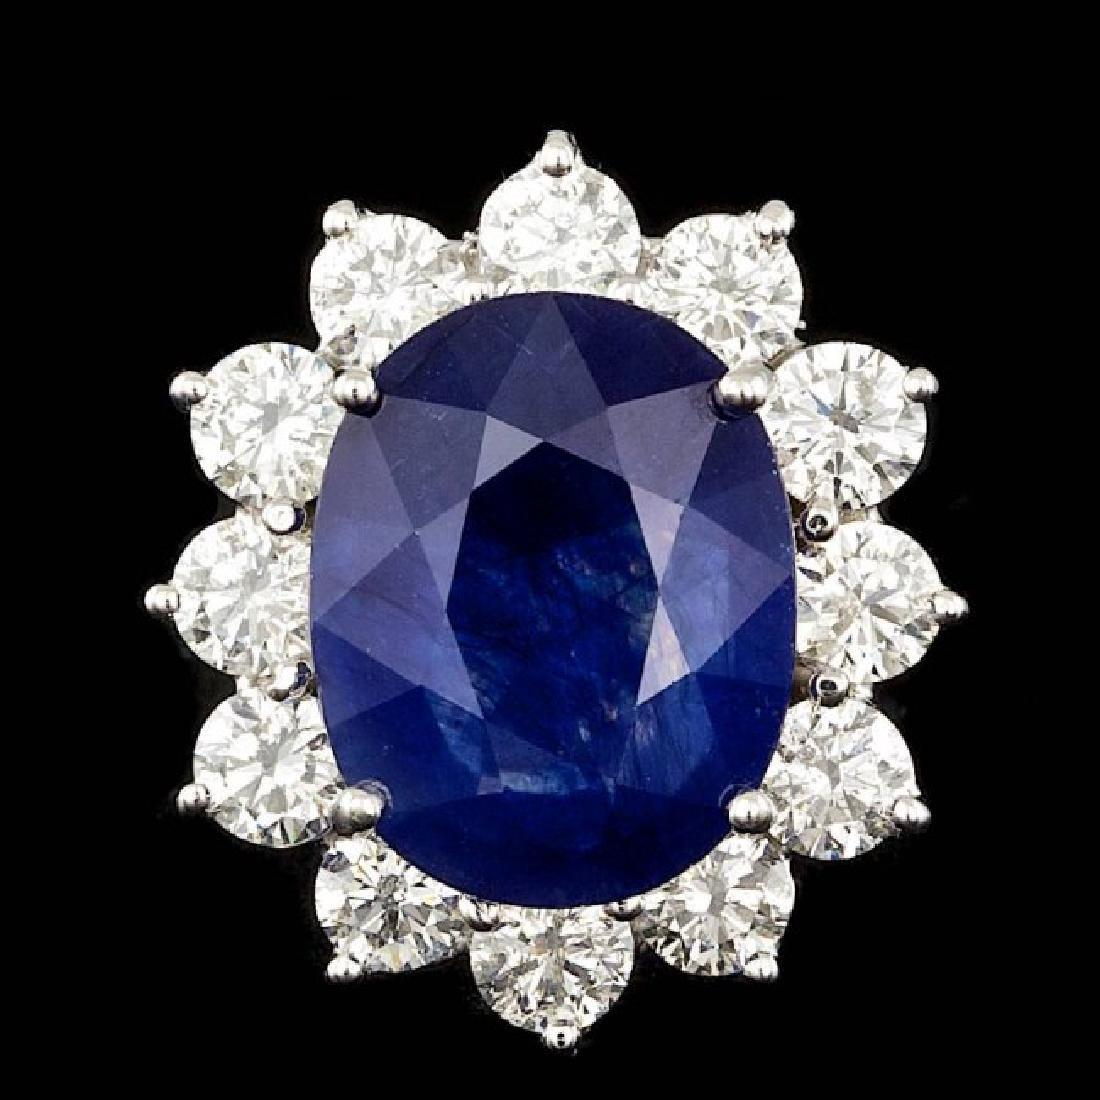 14k Gold 8.50ct Sapphire 2.50ct Diamond Ring